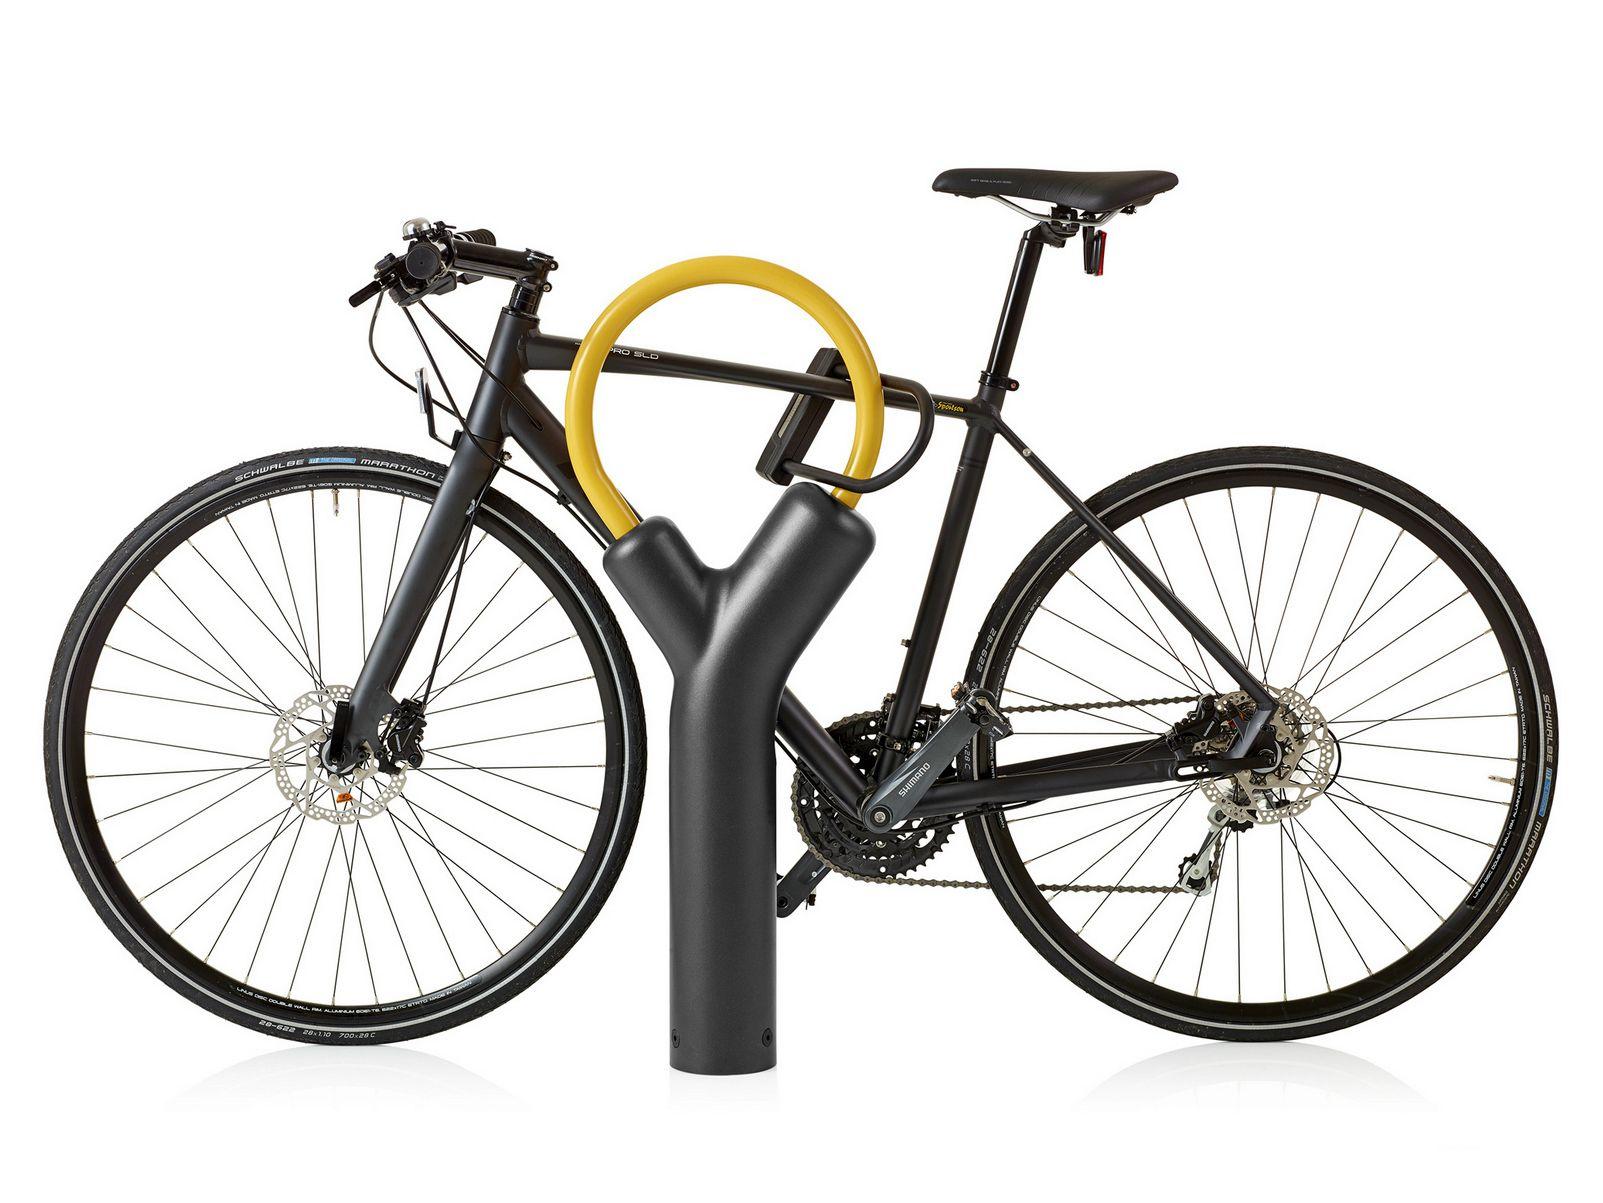 multifaction seat upgrade black stand shelf pin cycling aluminum adjustable alloy cargo capacity carrier unload racks quick rack bike